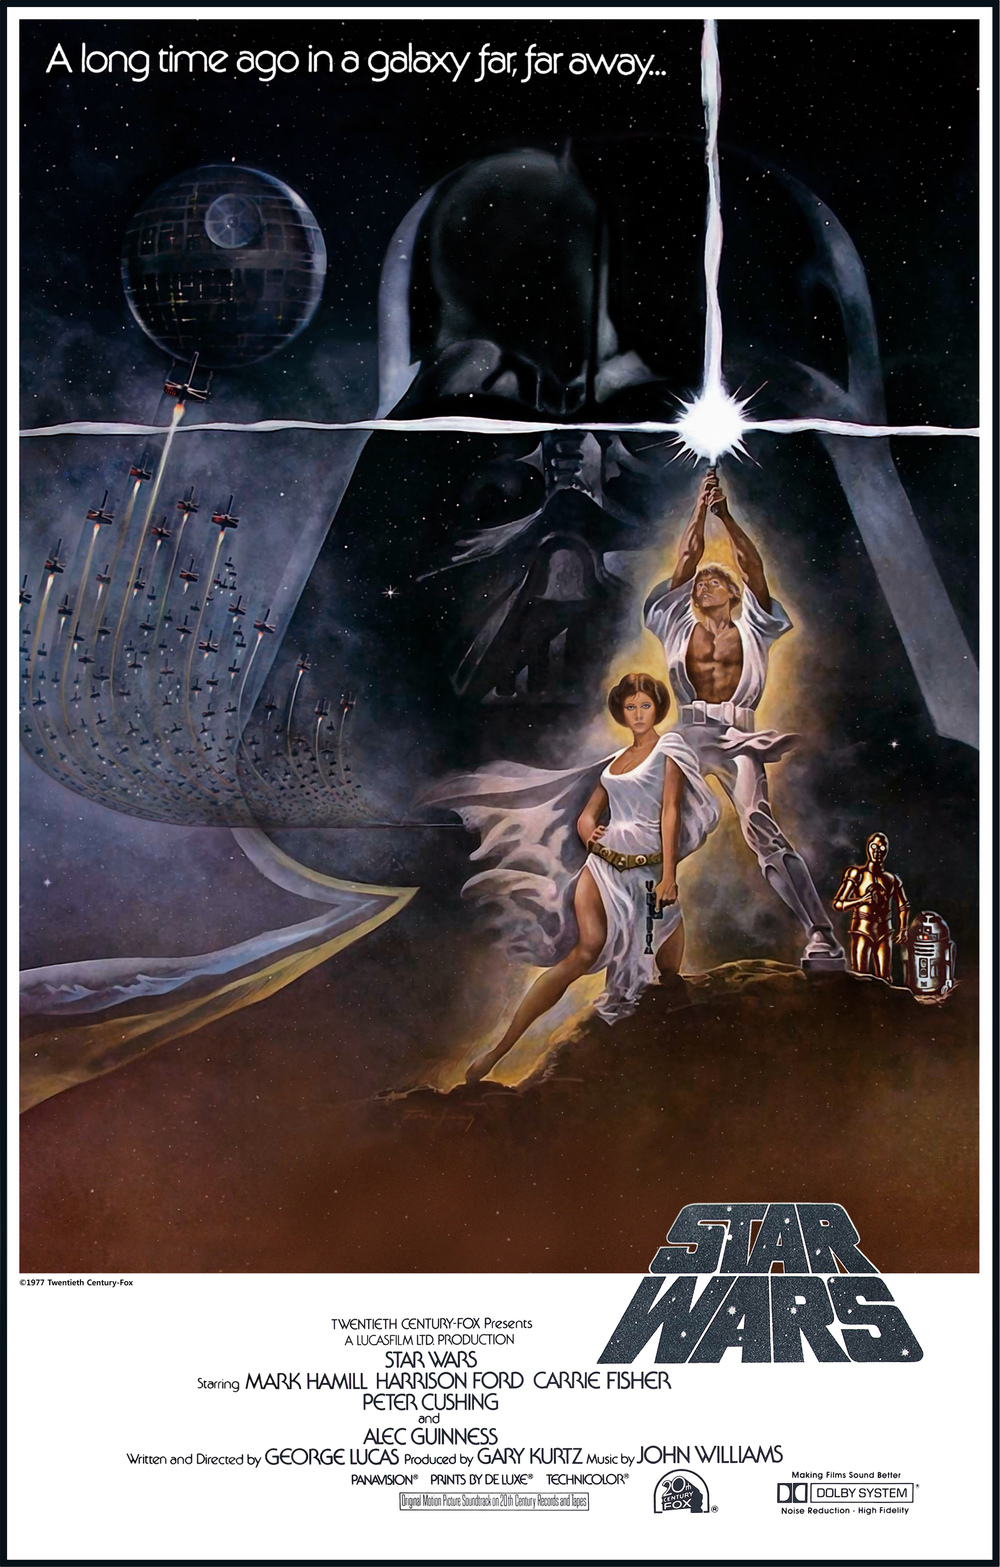 Star Wars Style A.jpg